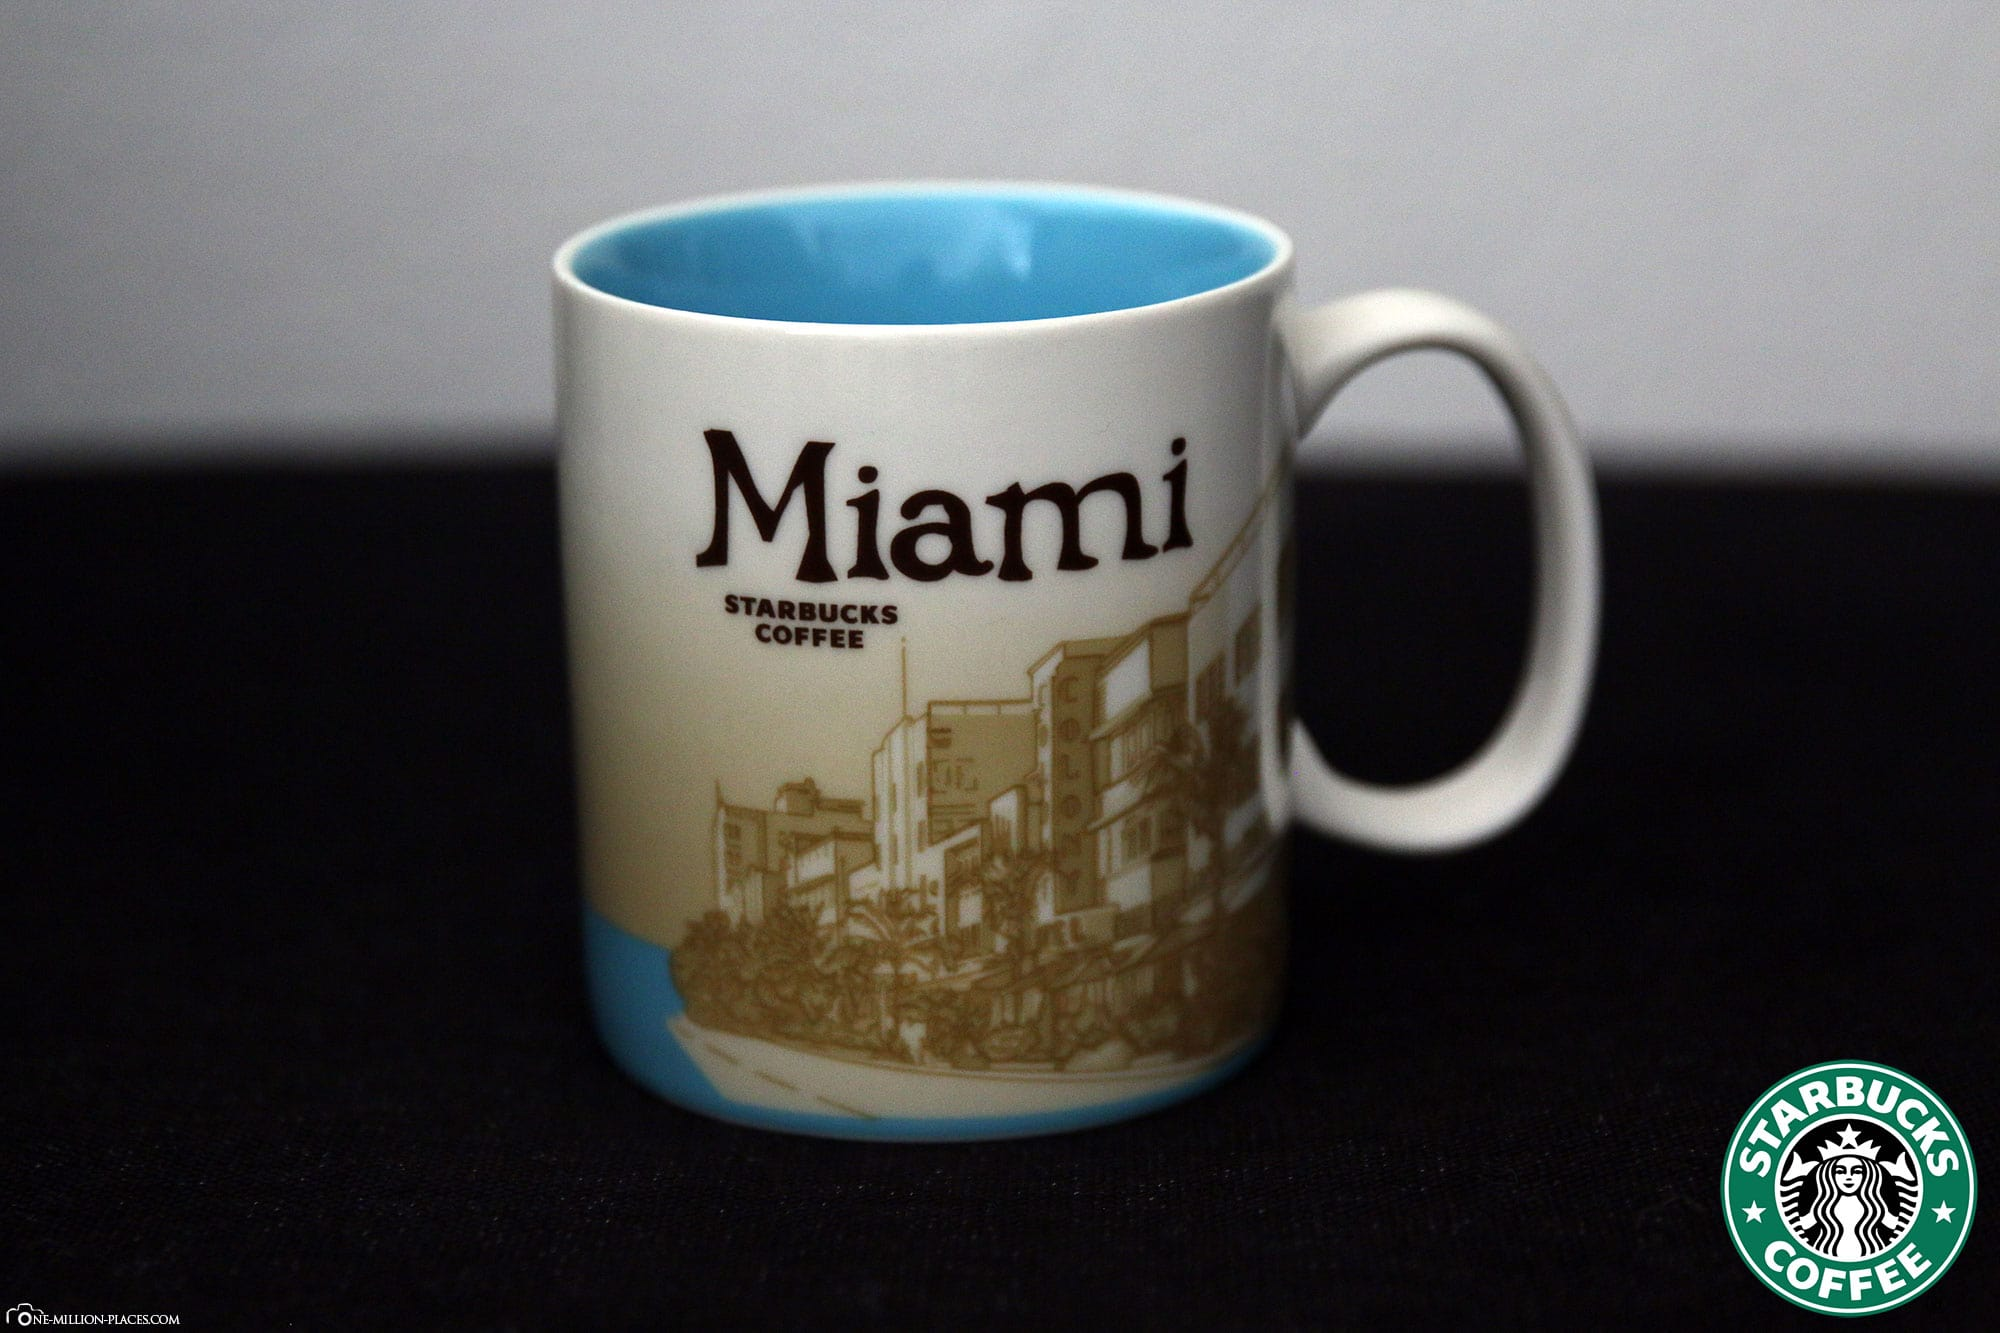 Miami, Starbucks Tasse, Global Icon Serie, City Mugs, Sammlung, USA, Reisebericht